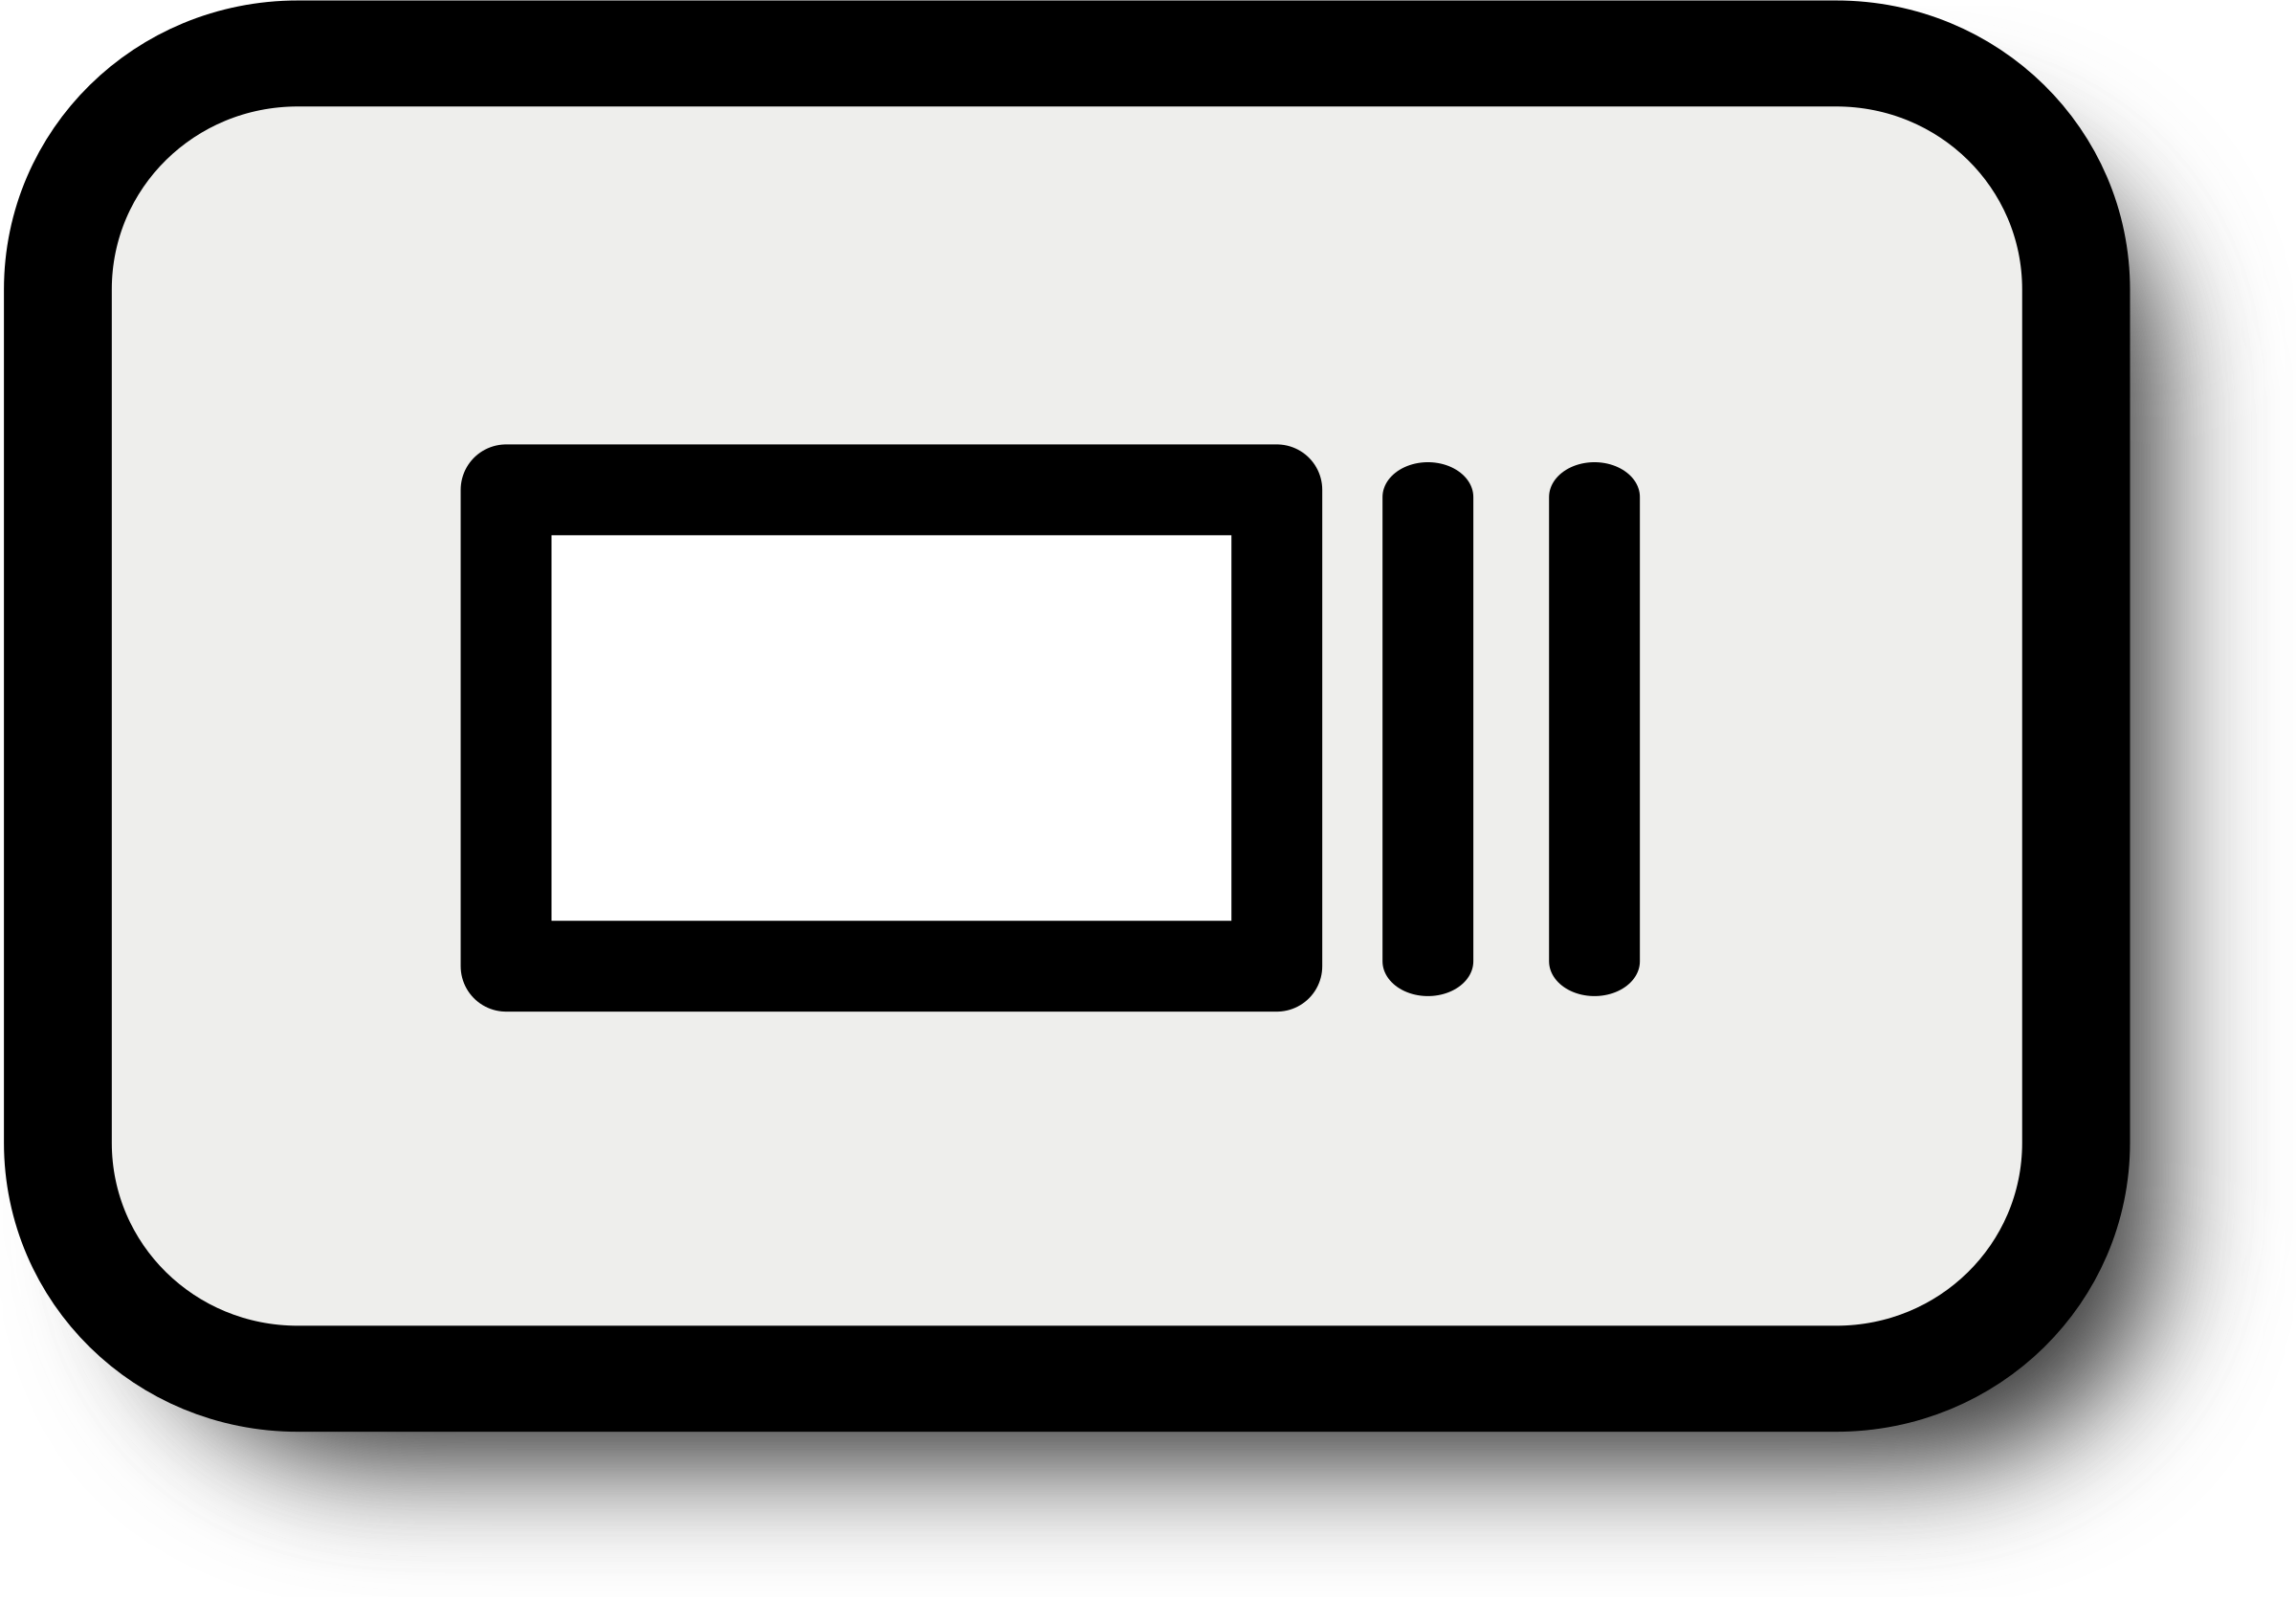 Keyboard clipart chromebook keyboard. Partial screenshot key icons